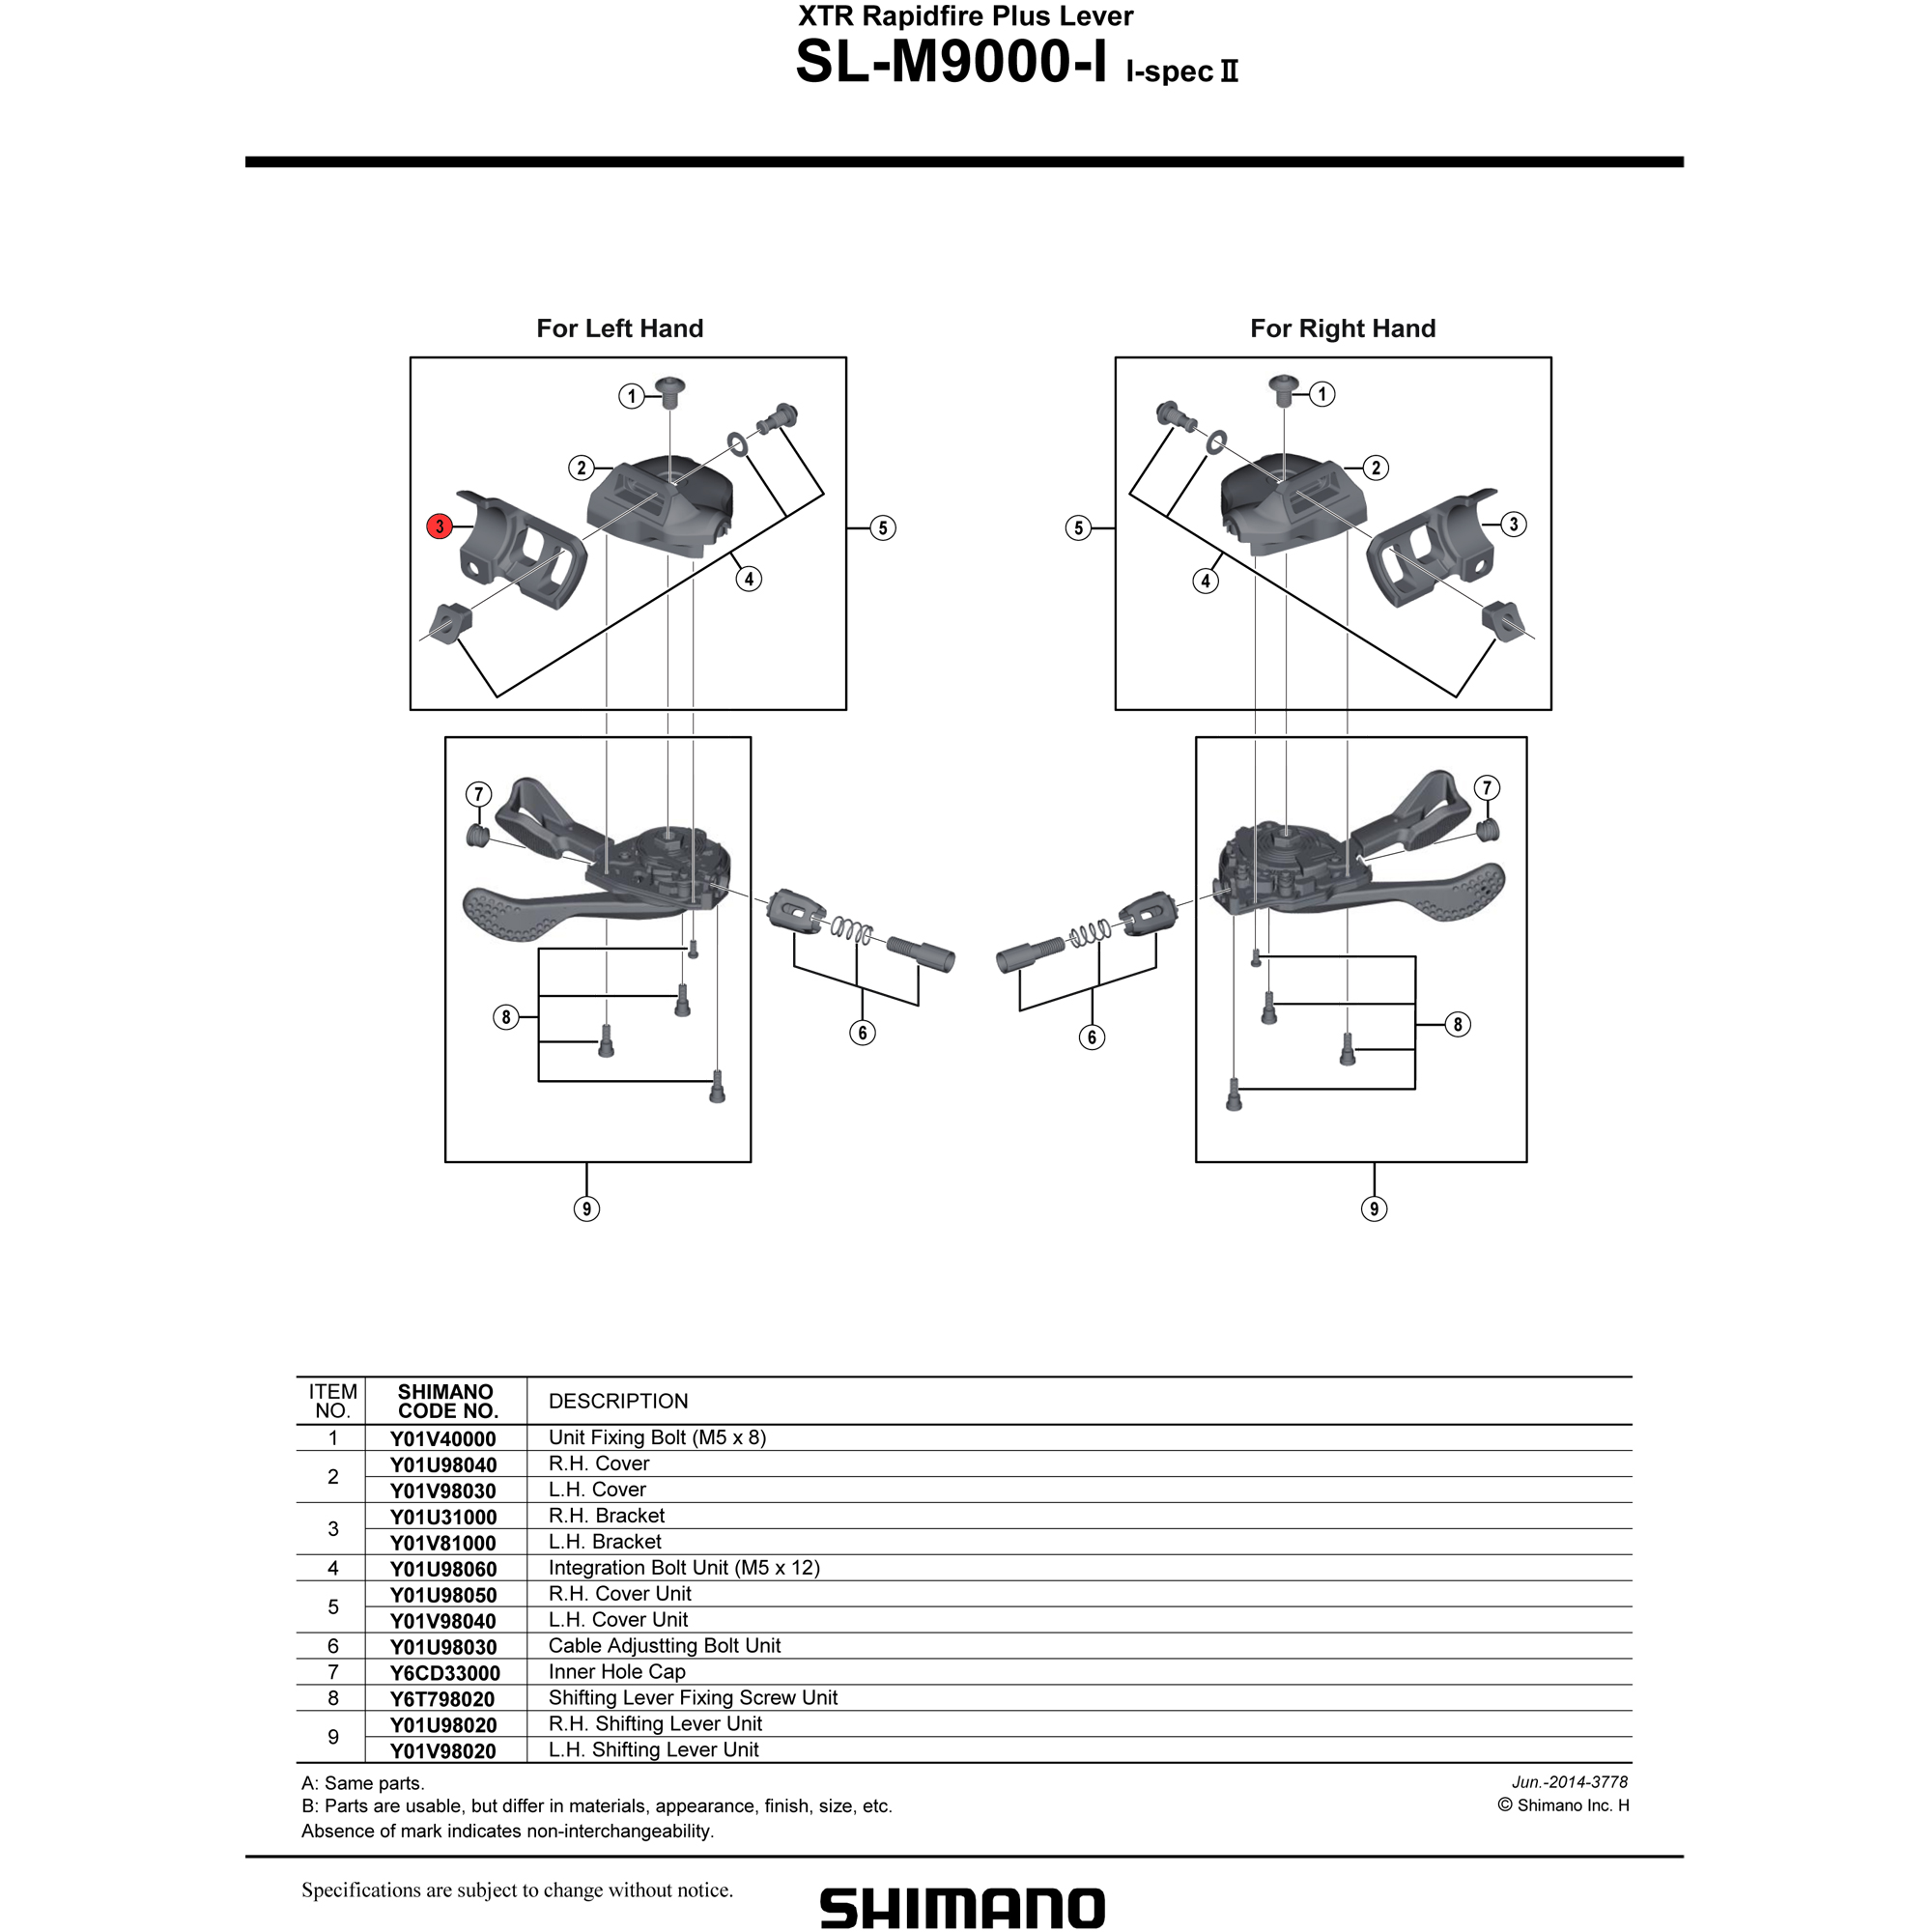 Left Hand Shimano XTR SL-M9000-I I-Spec-II Rapidfire Plus Lever Cover Unit